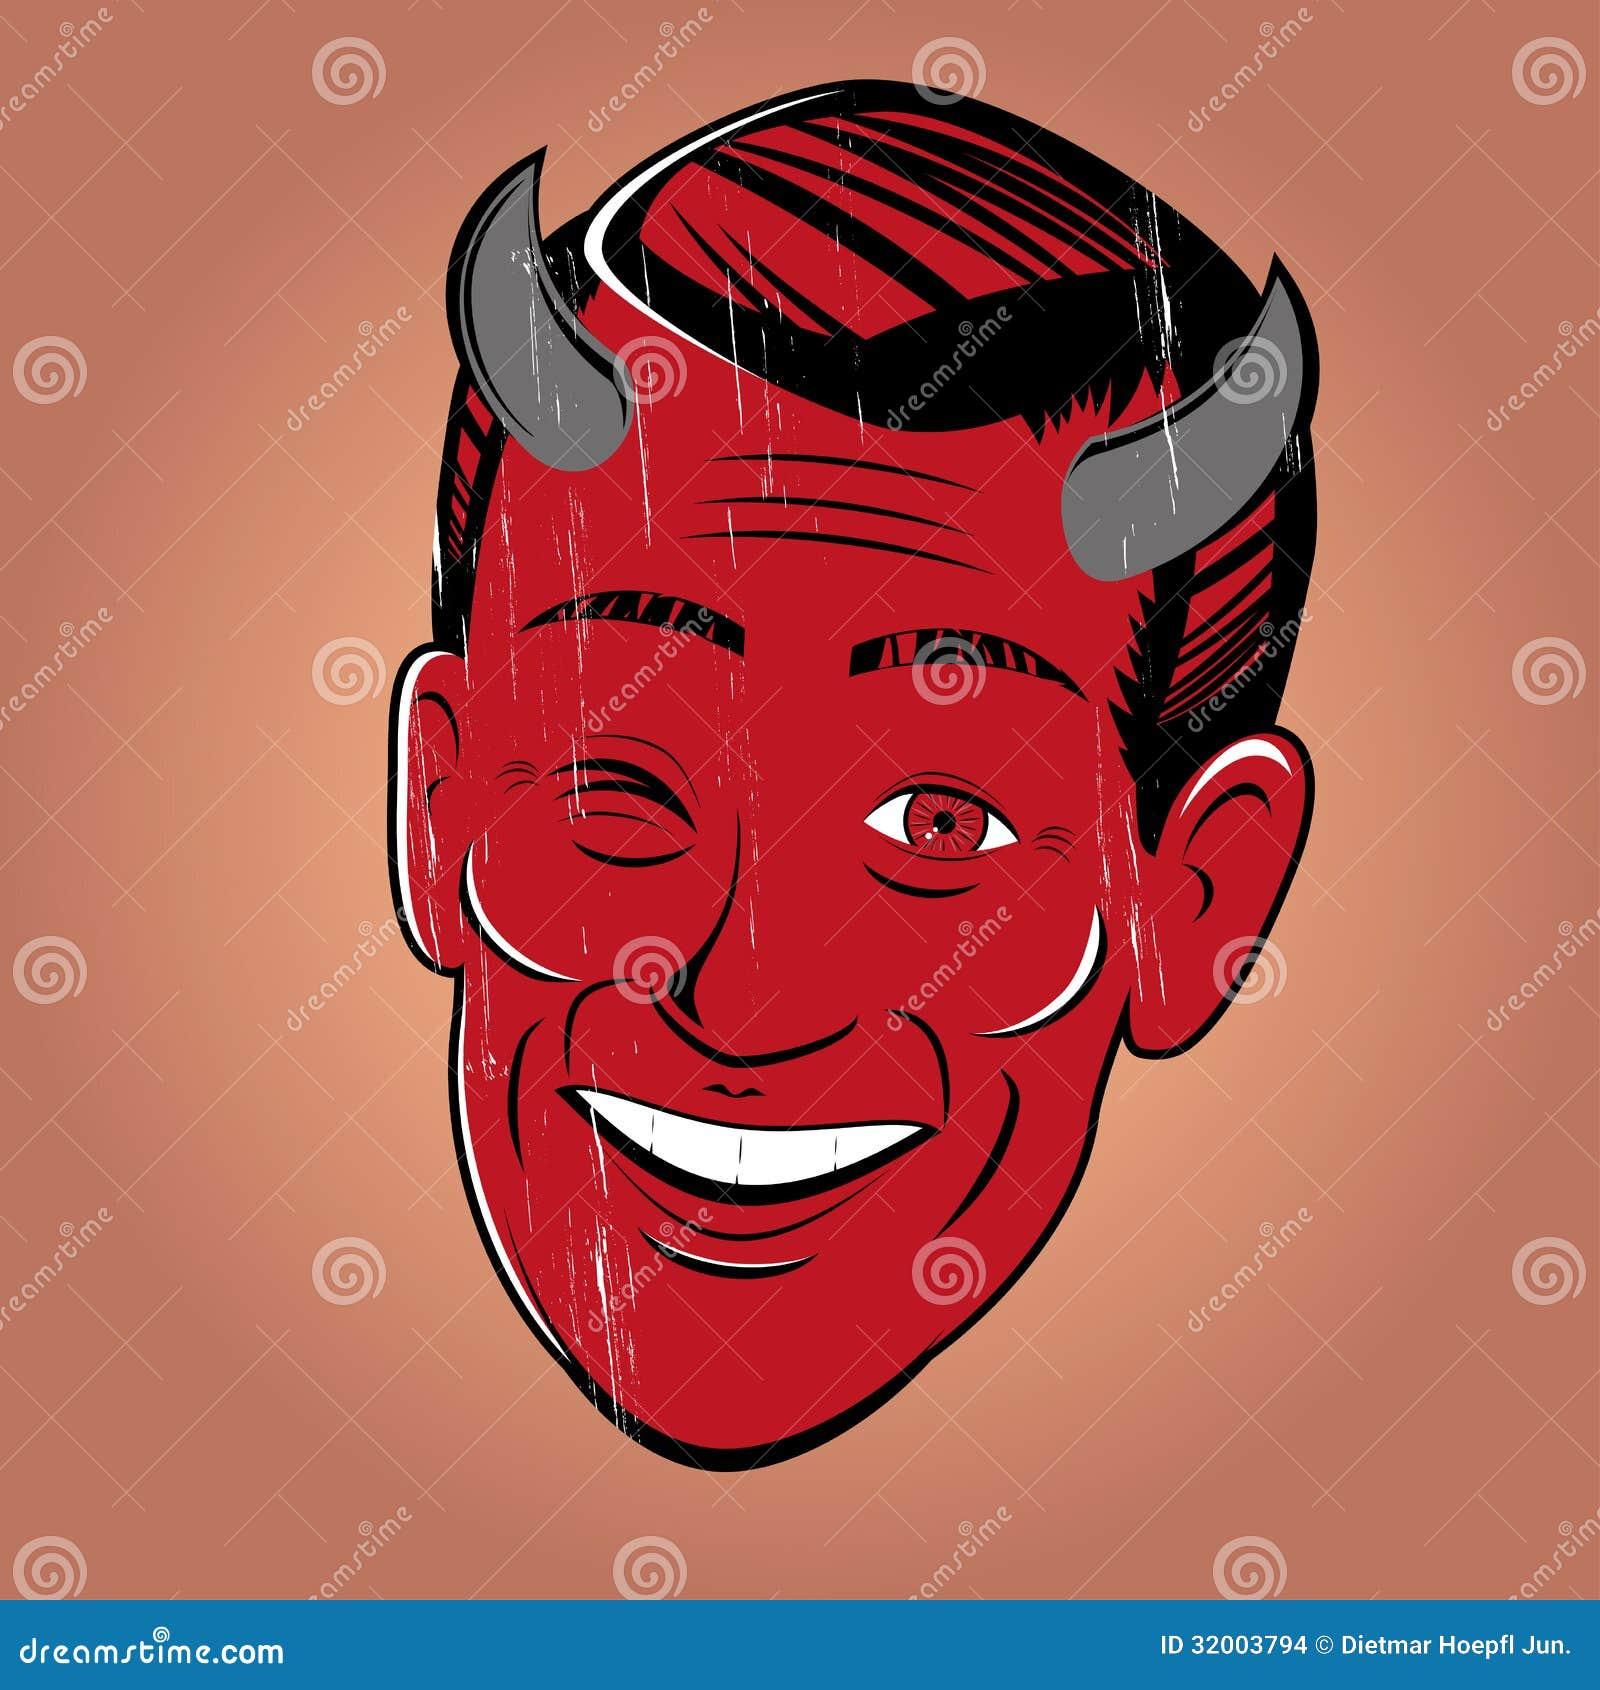 50s Posters moreover Episodios Do Desenho Animado Gato Felix Sao Sonorizados Ao Vivo No Mis as well Stock Images Winking Cartoon Devil Funny Illustration Image32003794 besides Adtour05 as well Cinammon roll. on old cartoons 50s